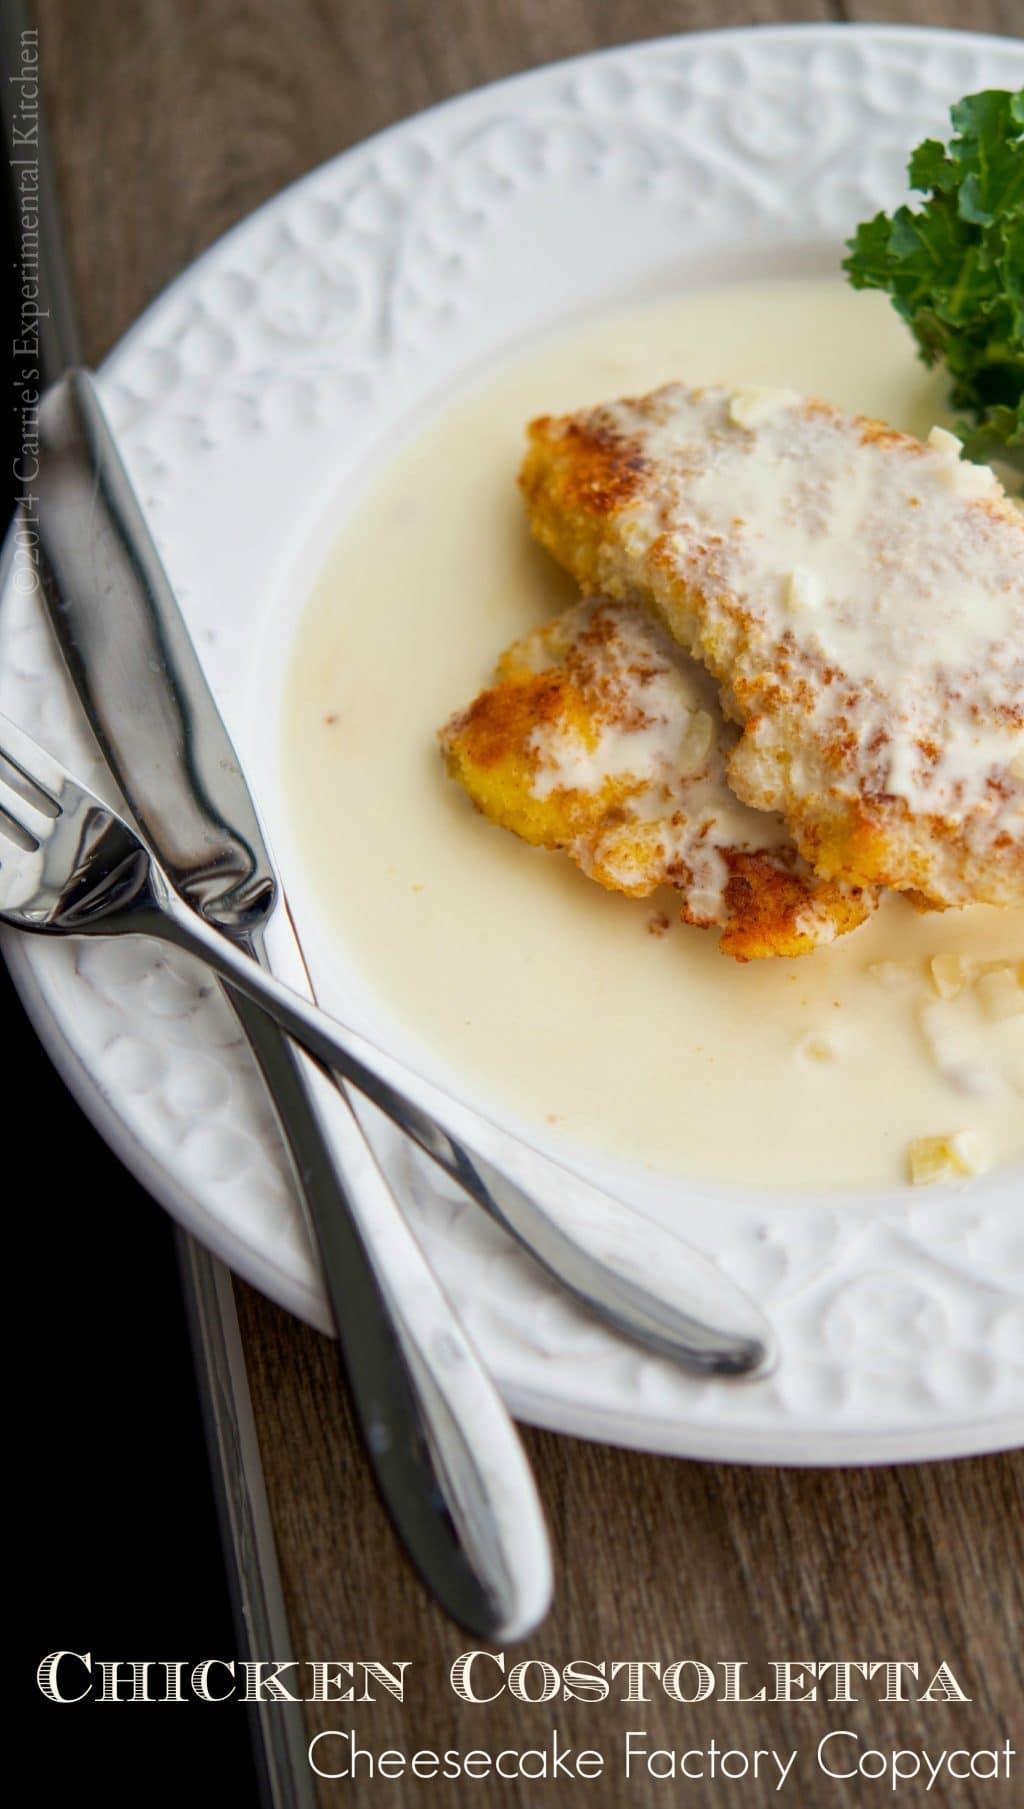 Copycat recipes cheesecake factory chicken costoletta